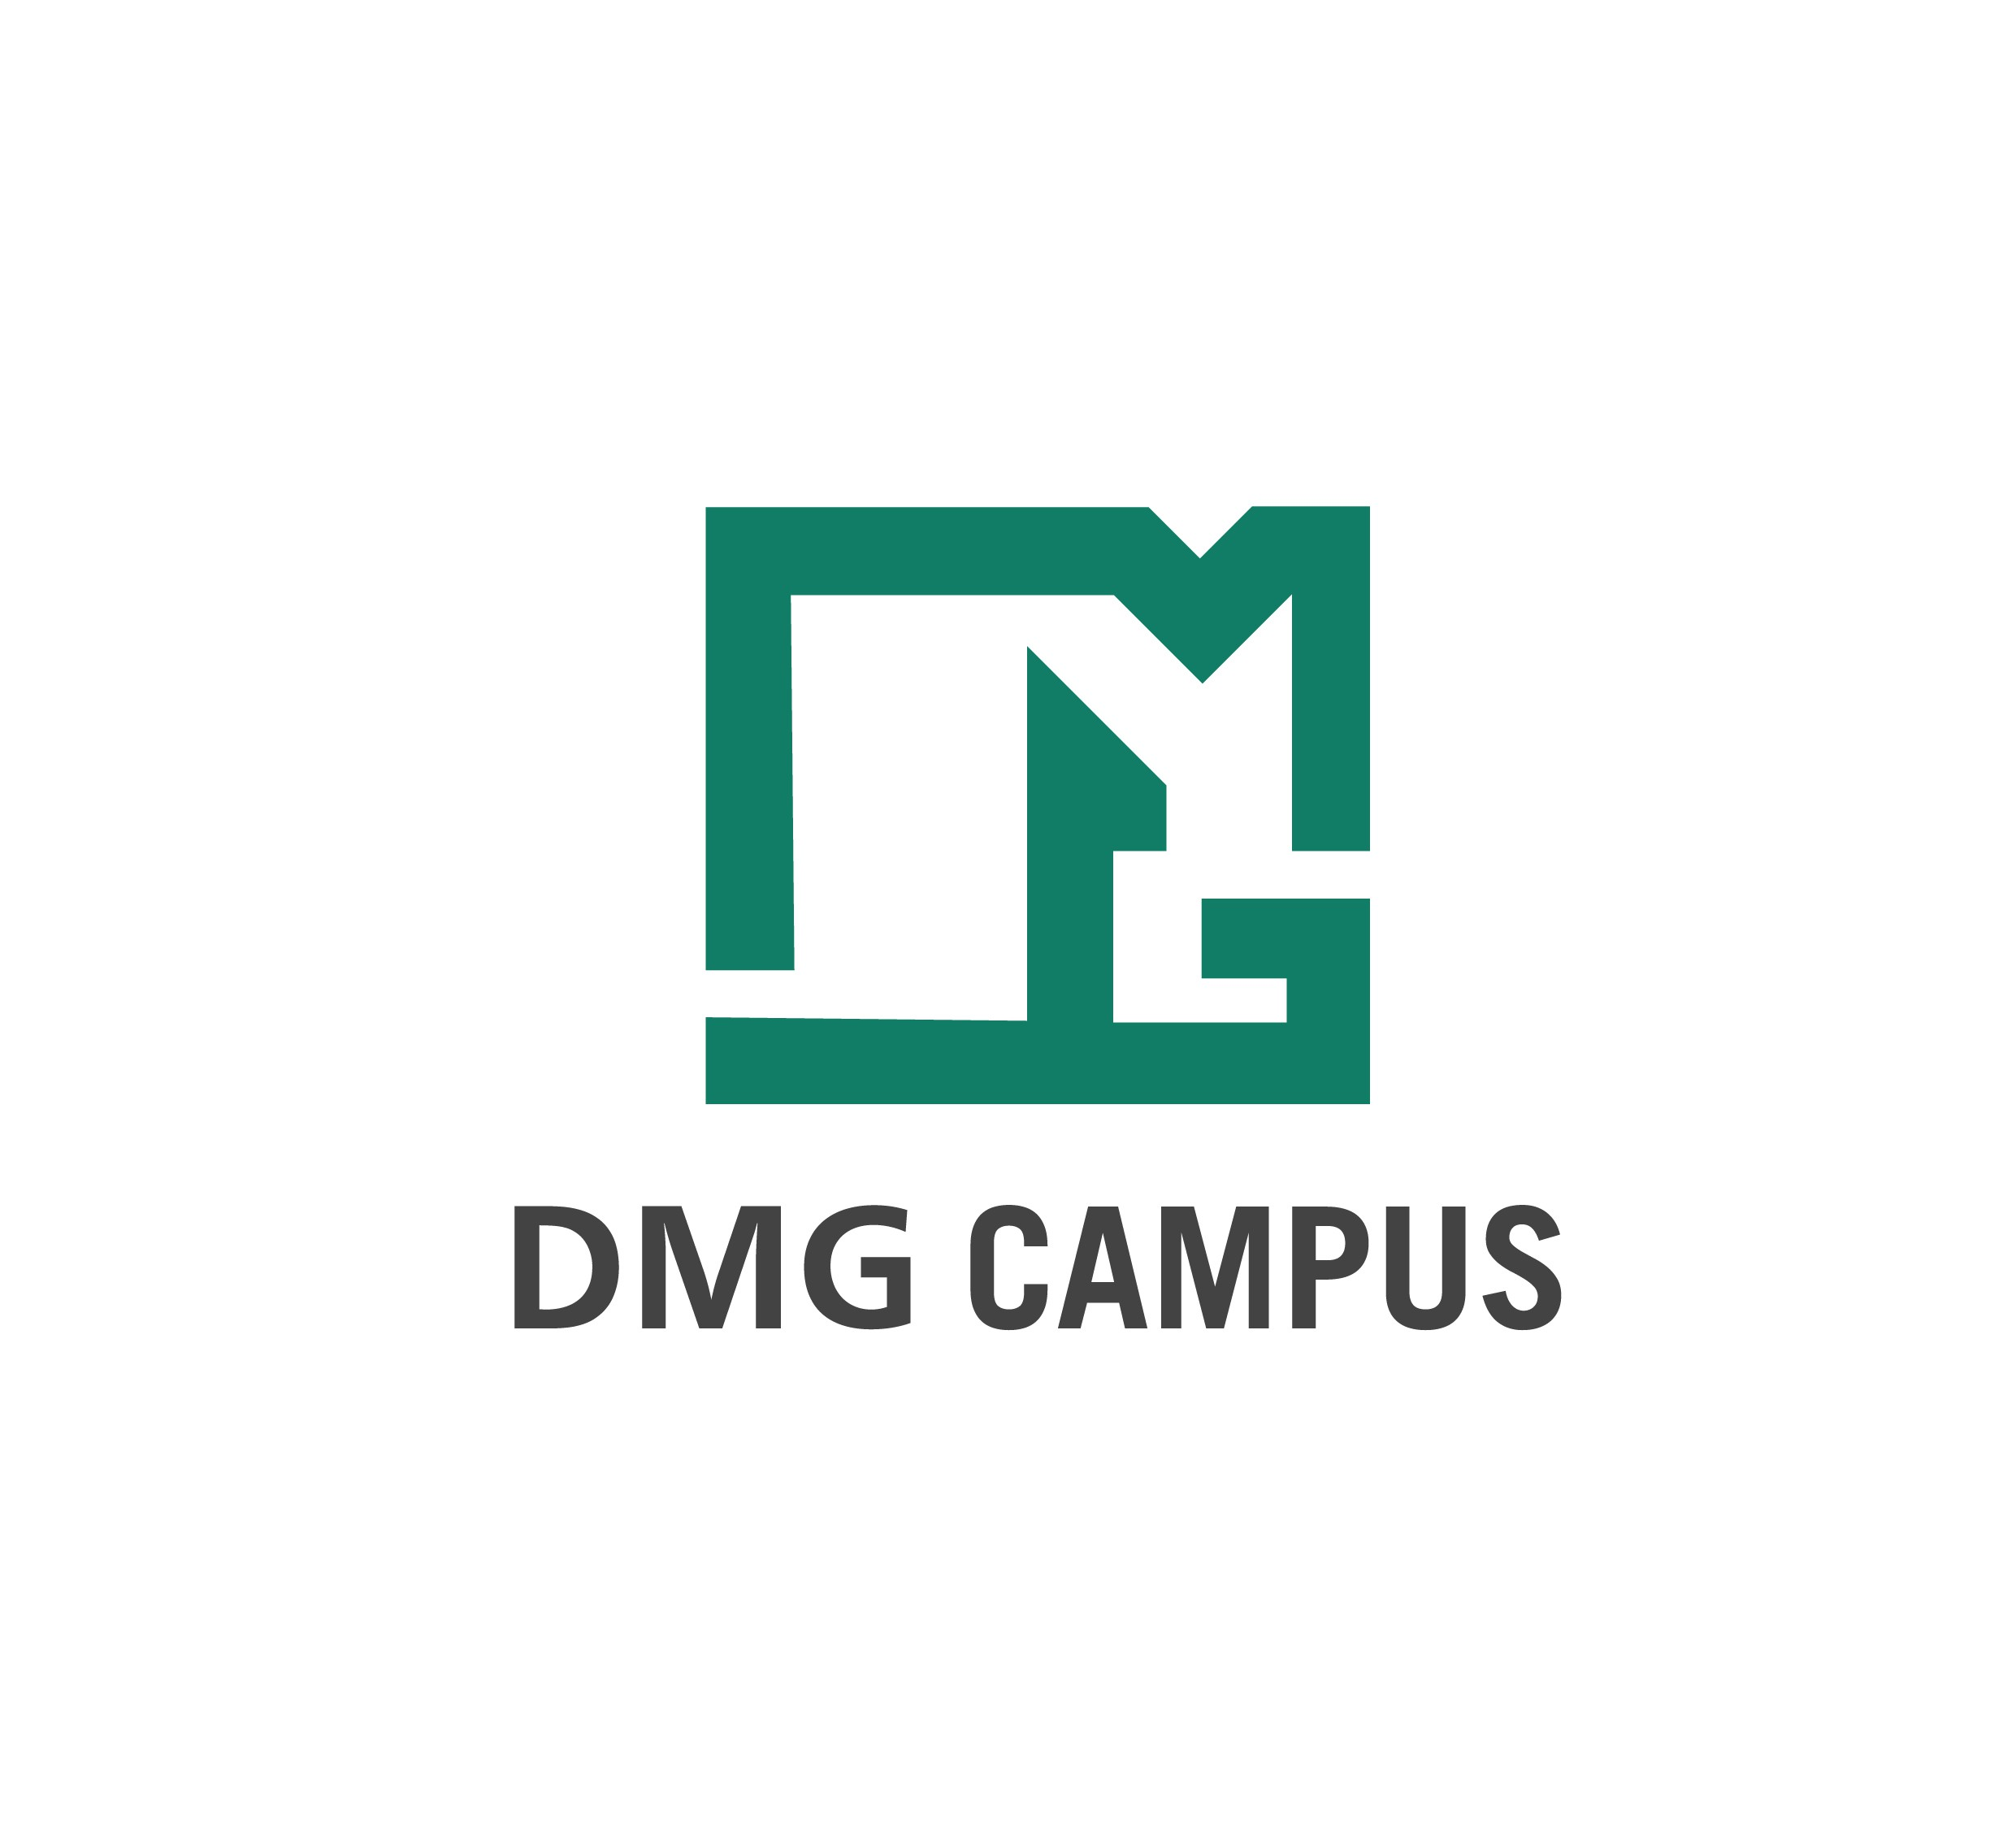 Logo for Campus